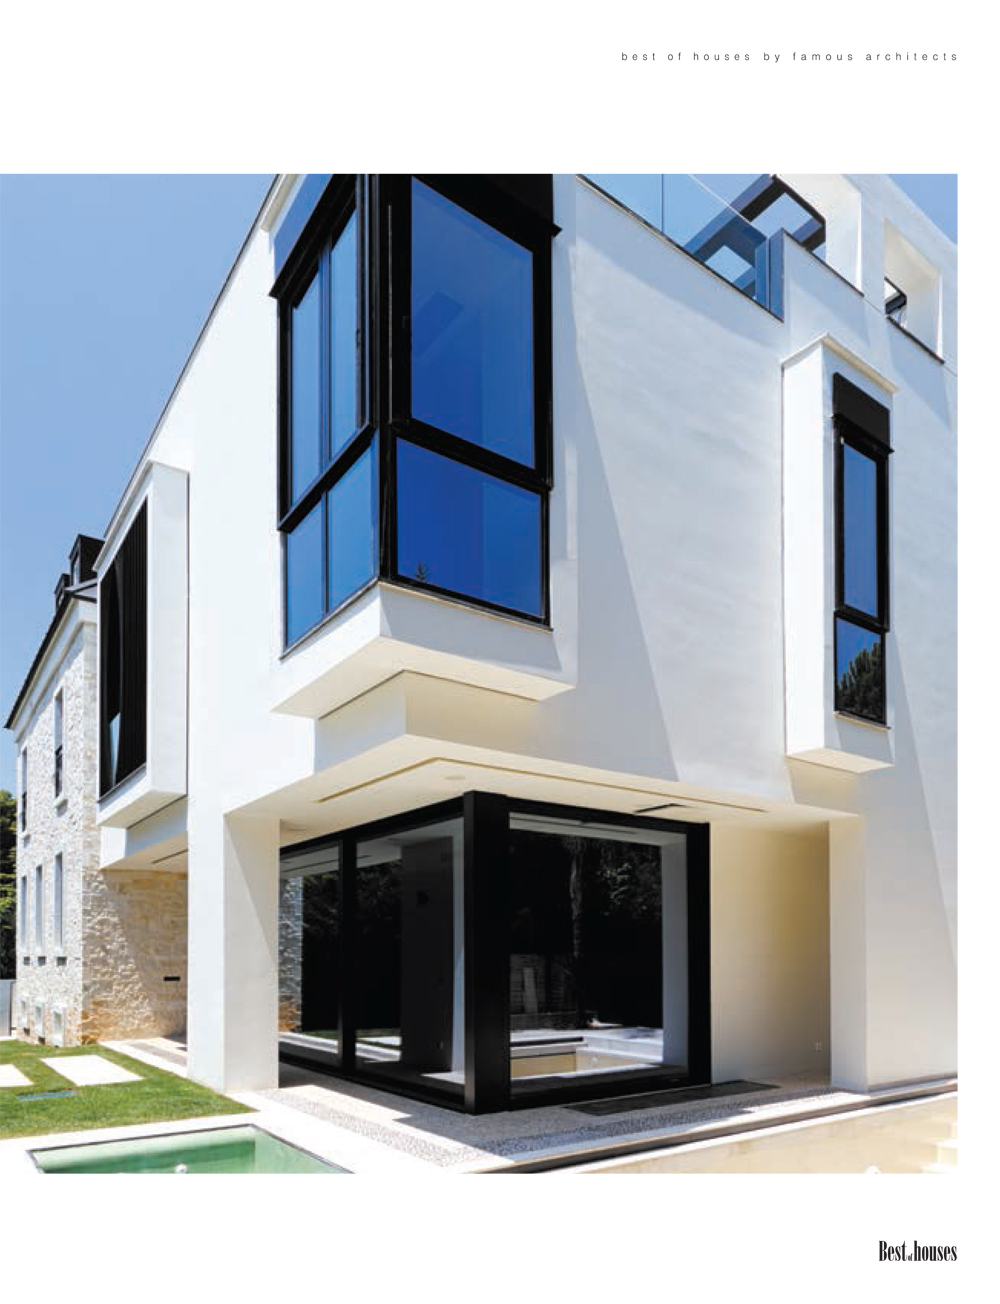 149_161_BoH_Dream_house-3.jpg